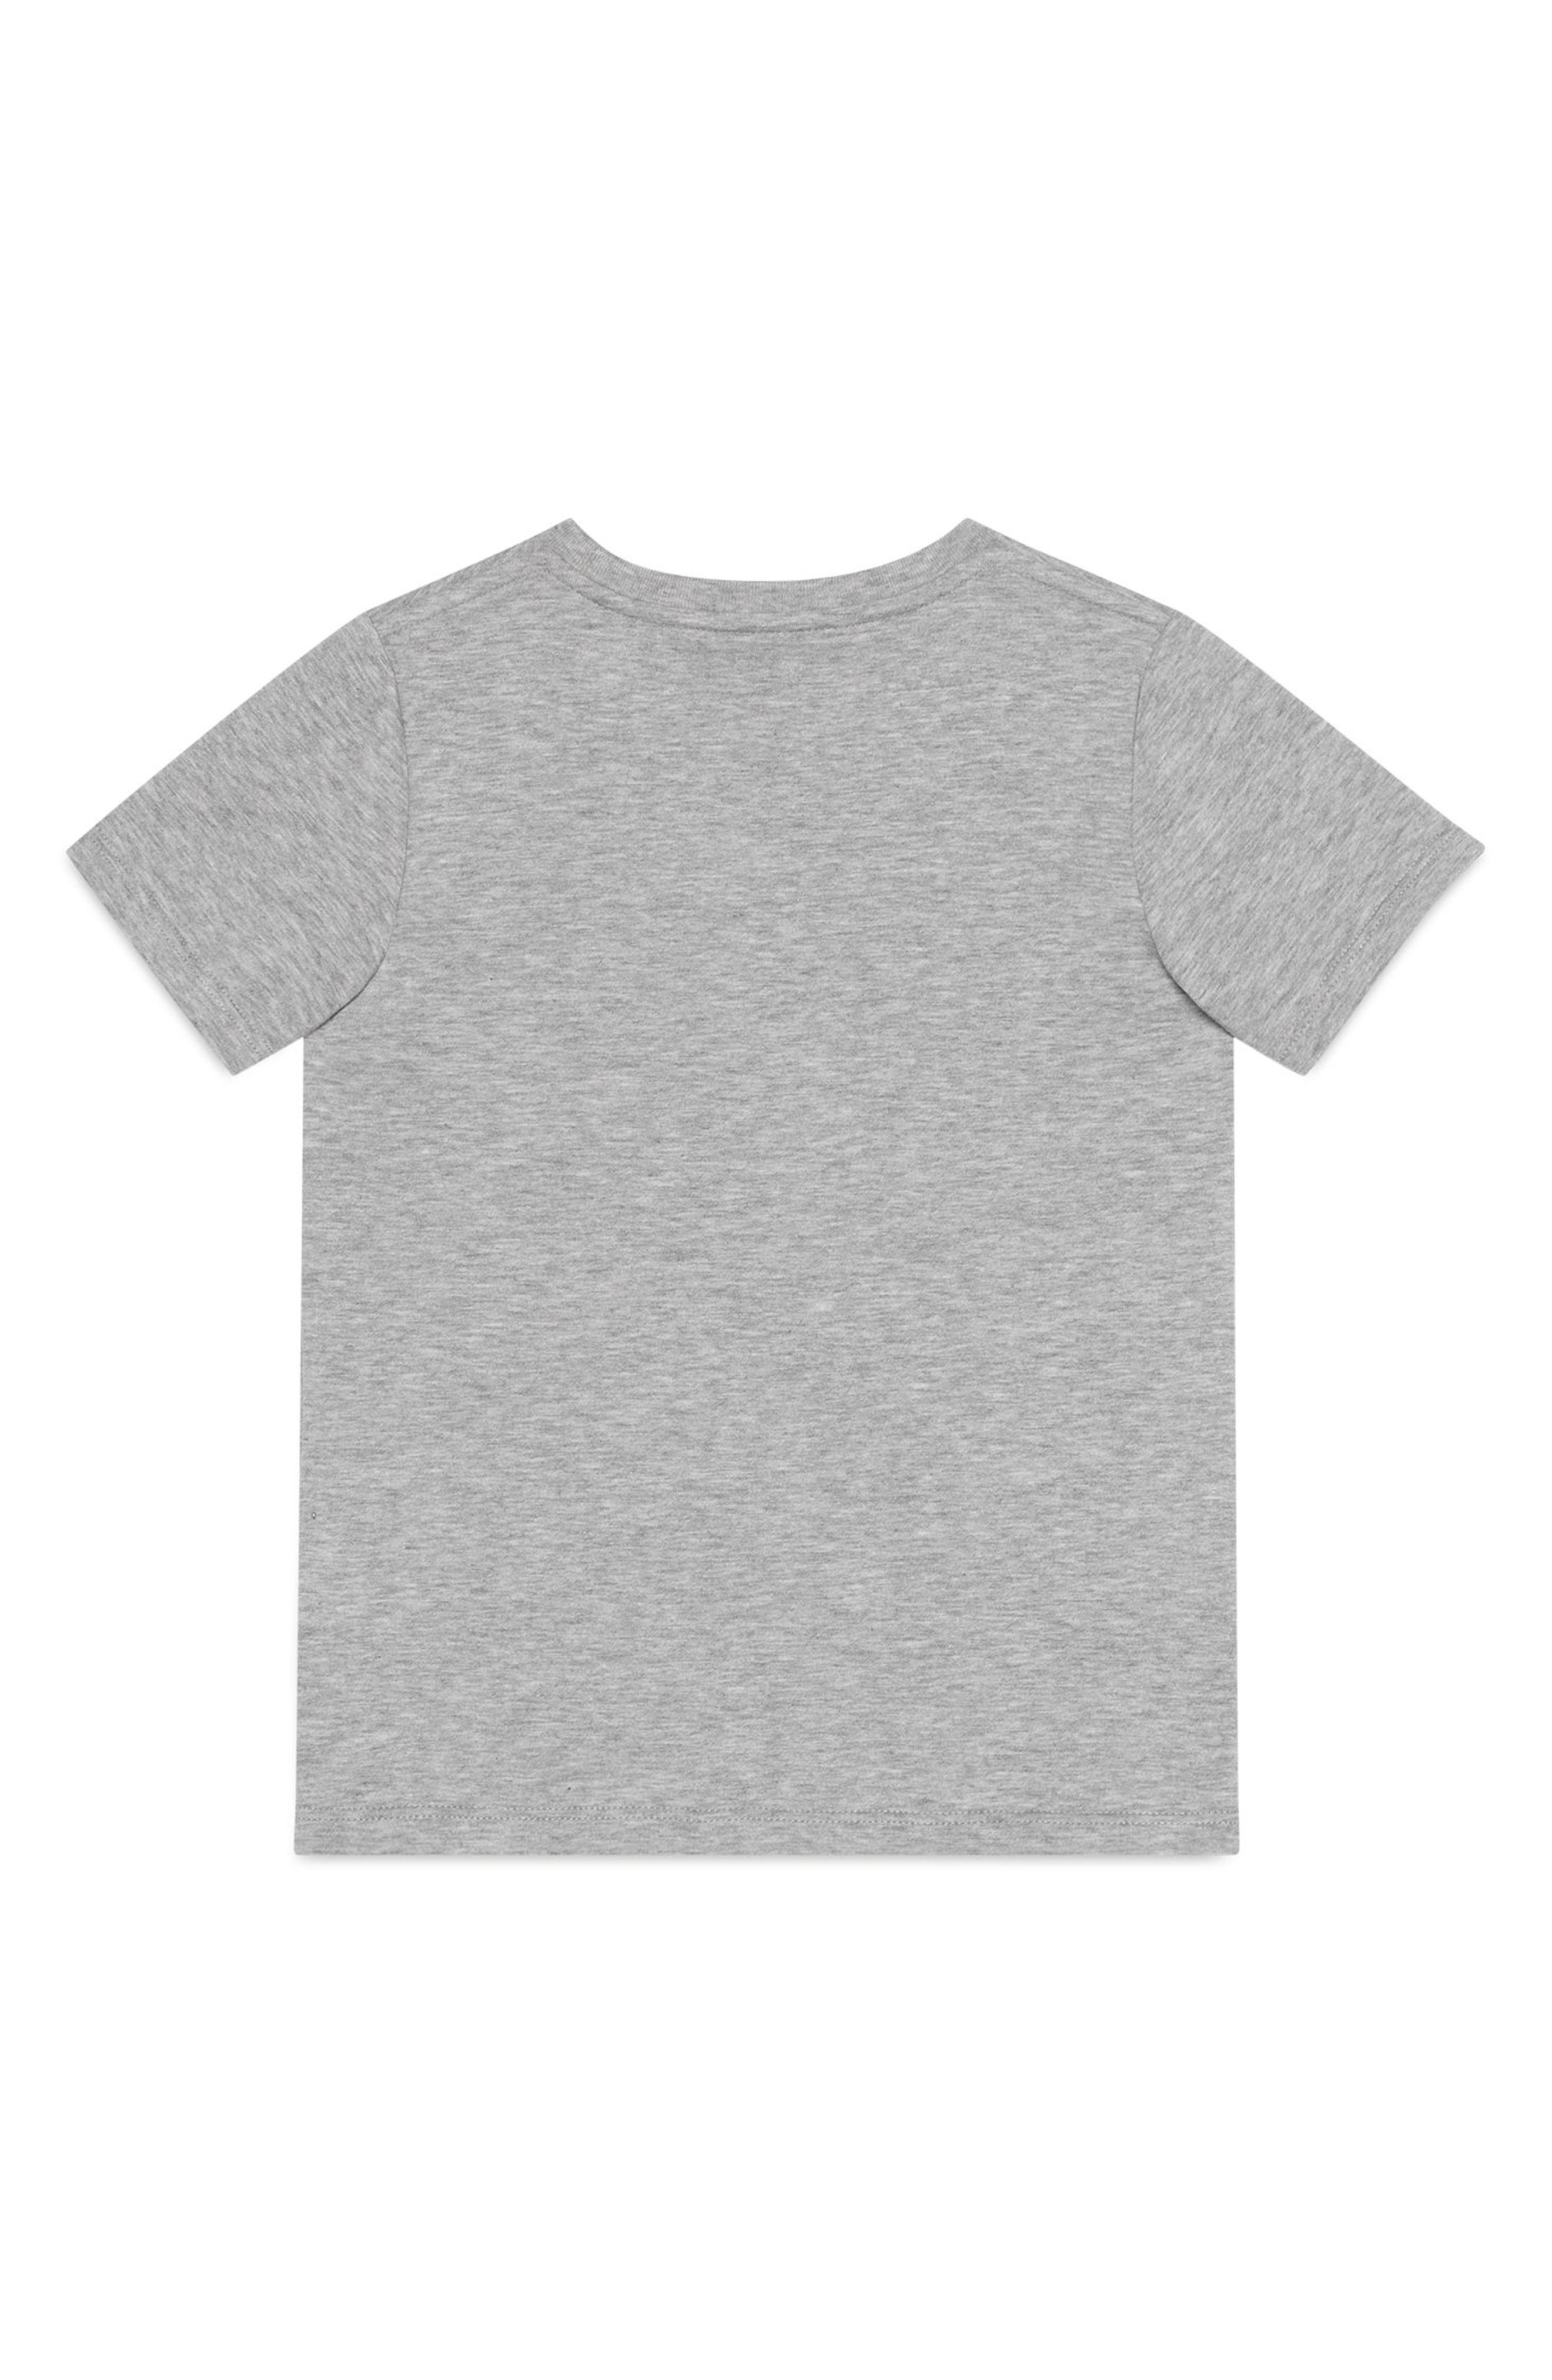 fbbd42acb63e gucci shirt